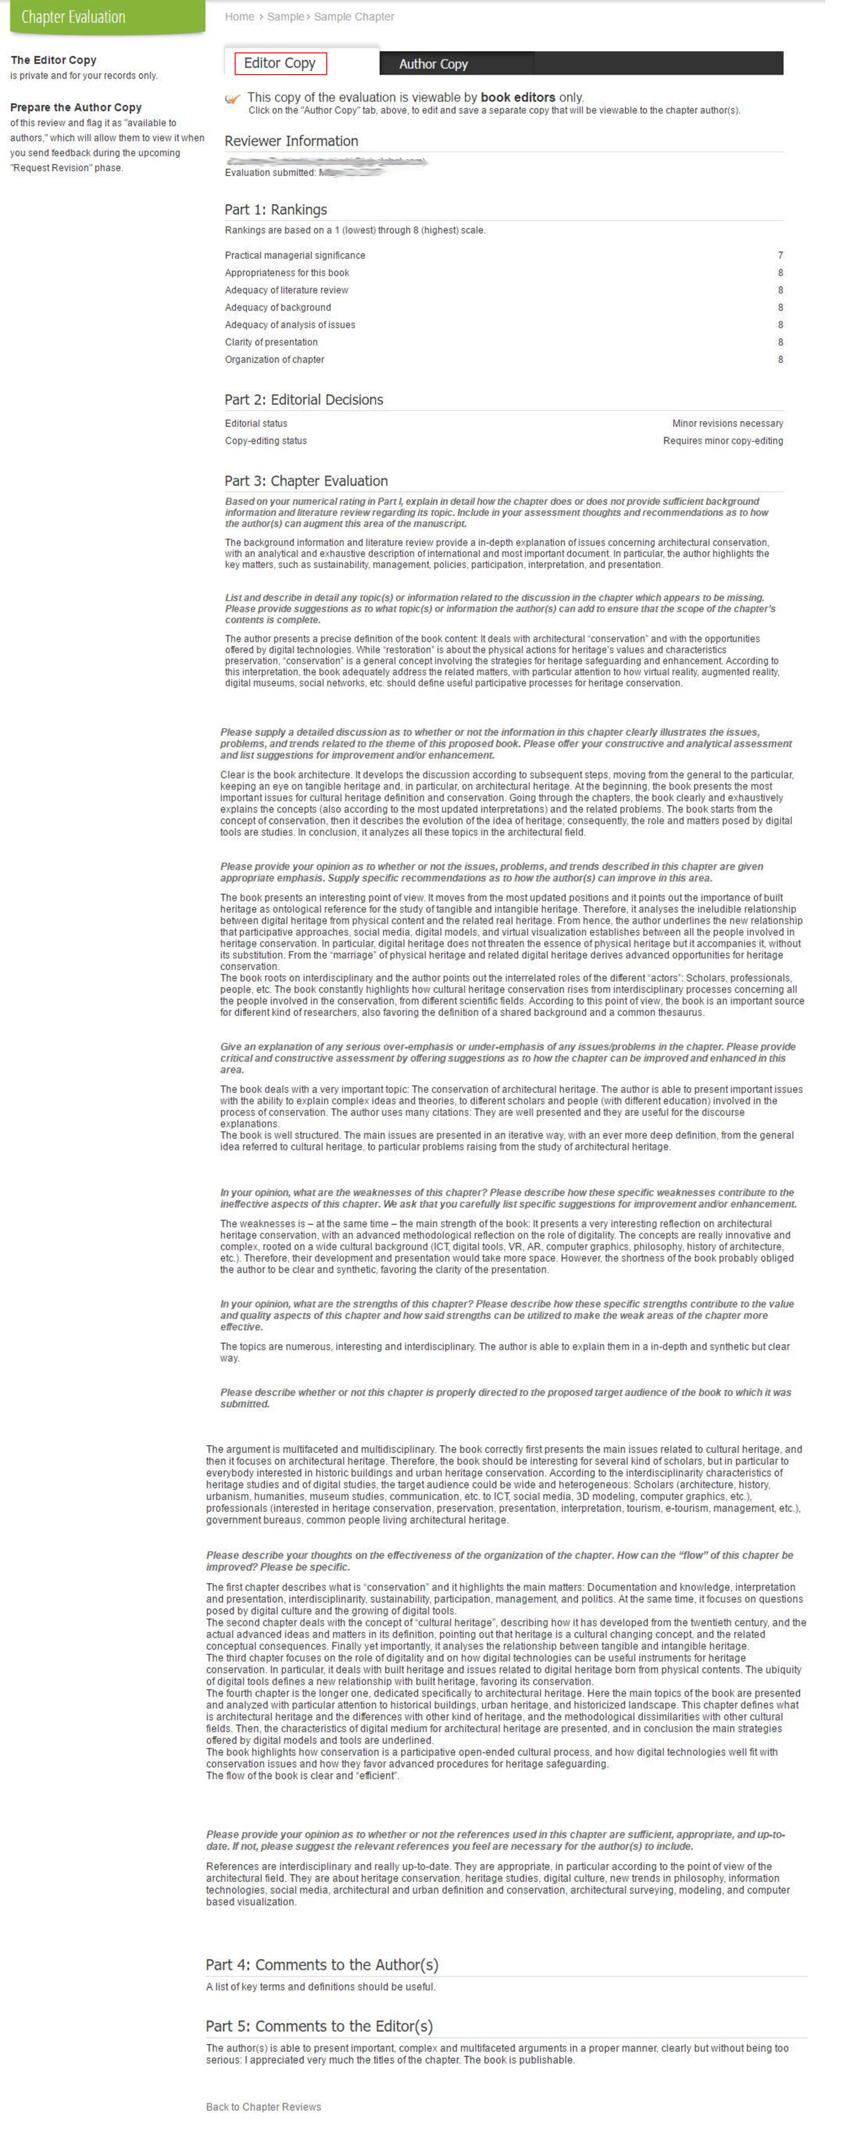 Sample Evaluation - Editor's Copy